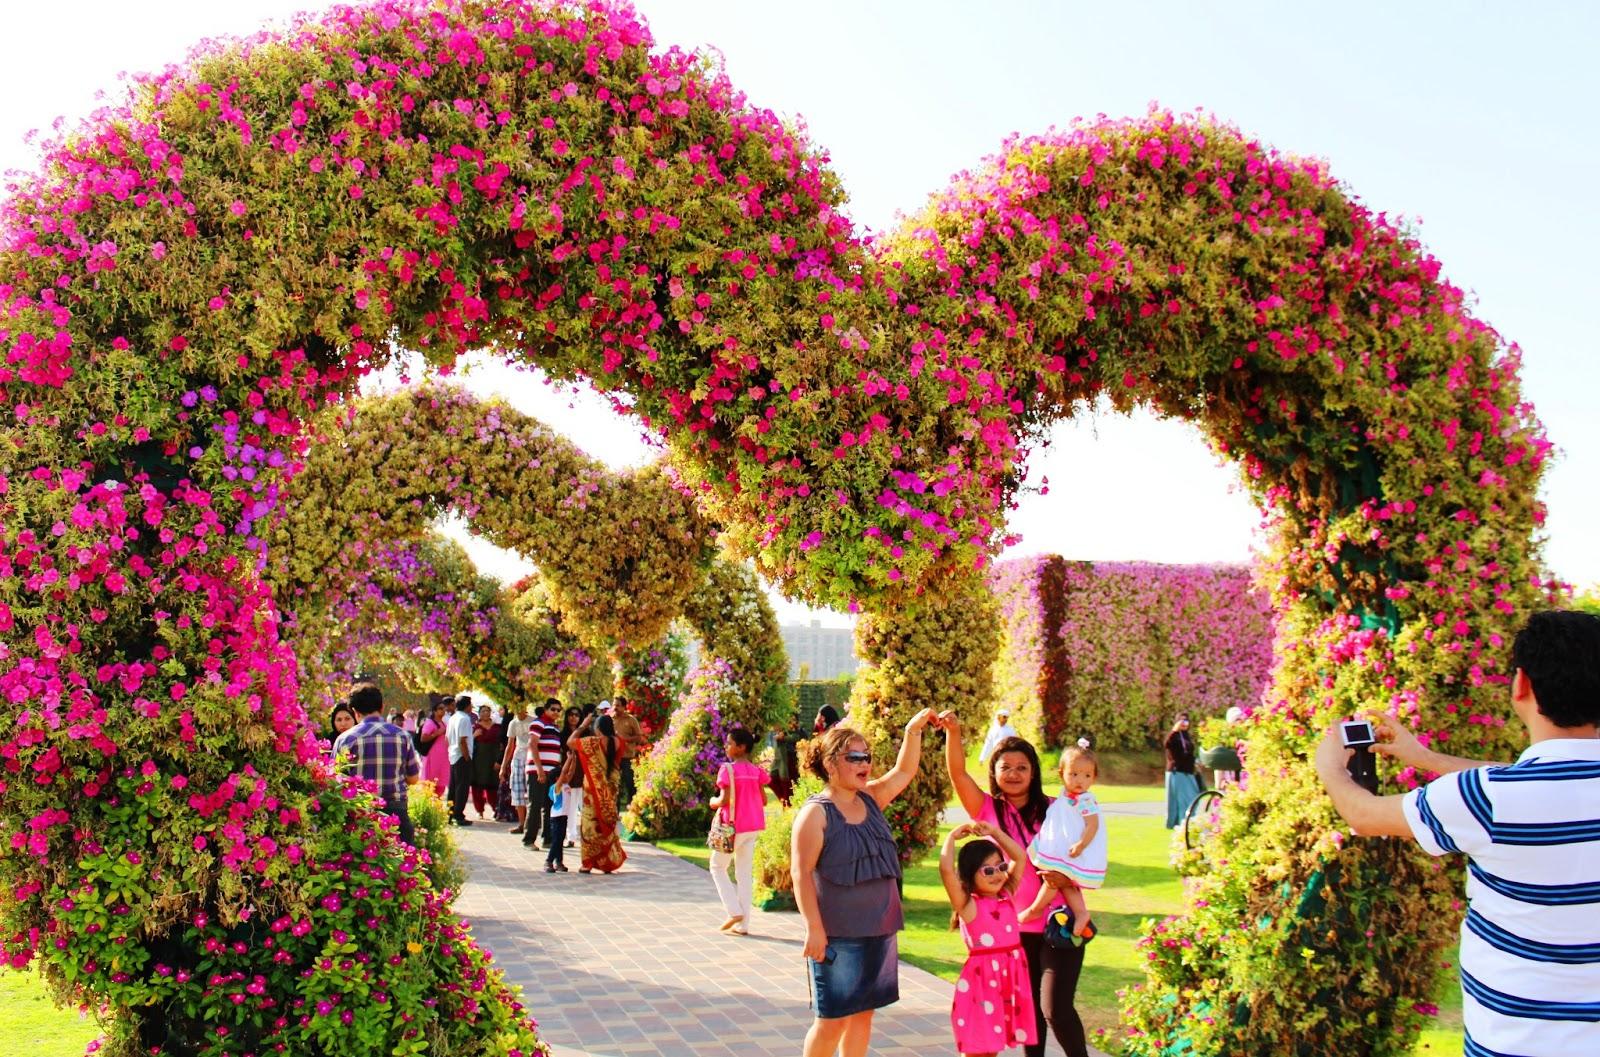 Having fun at Miracle Garden Dubai | The Street Photo Blog of ...